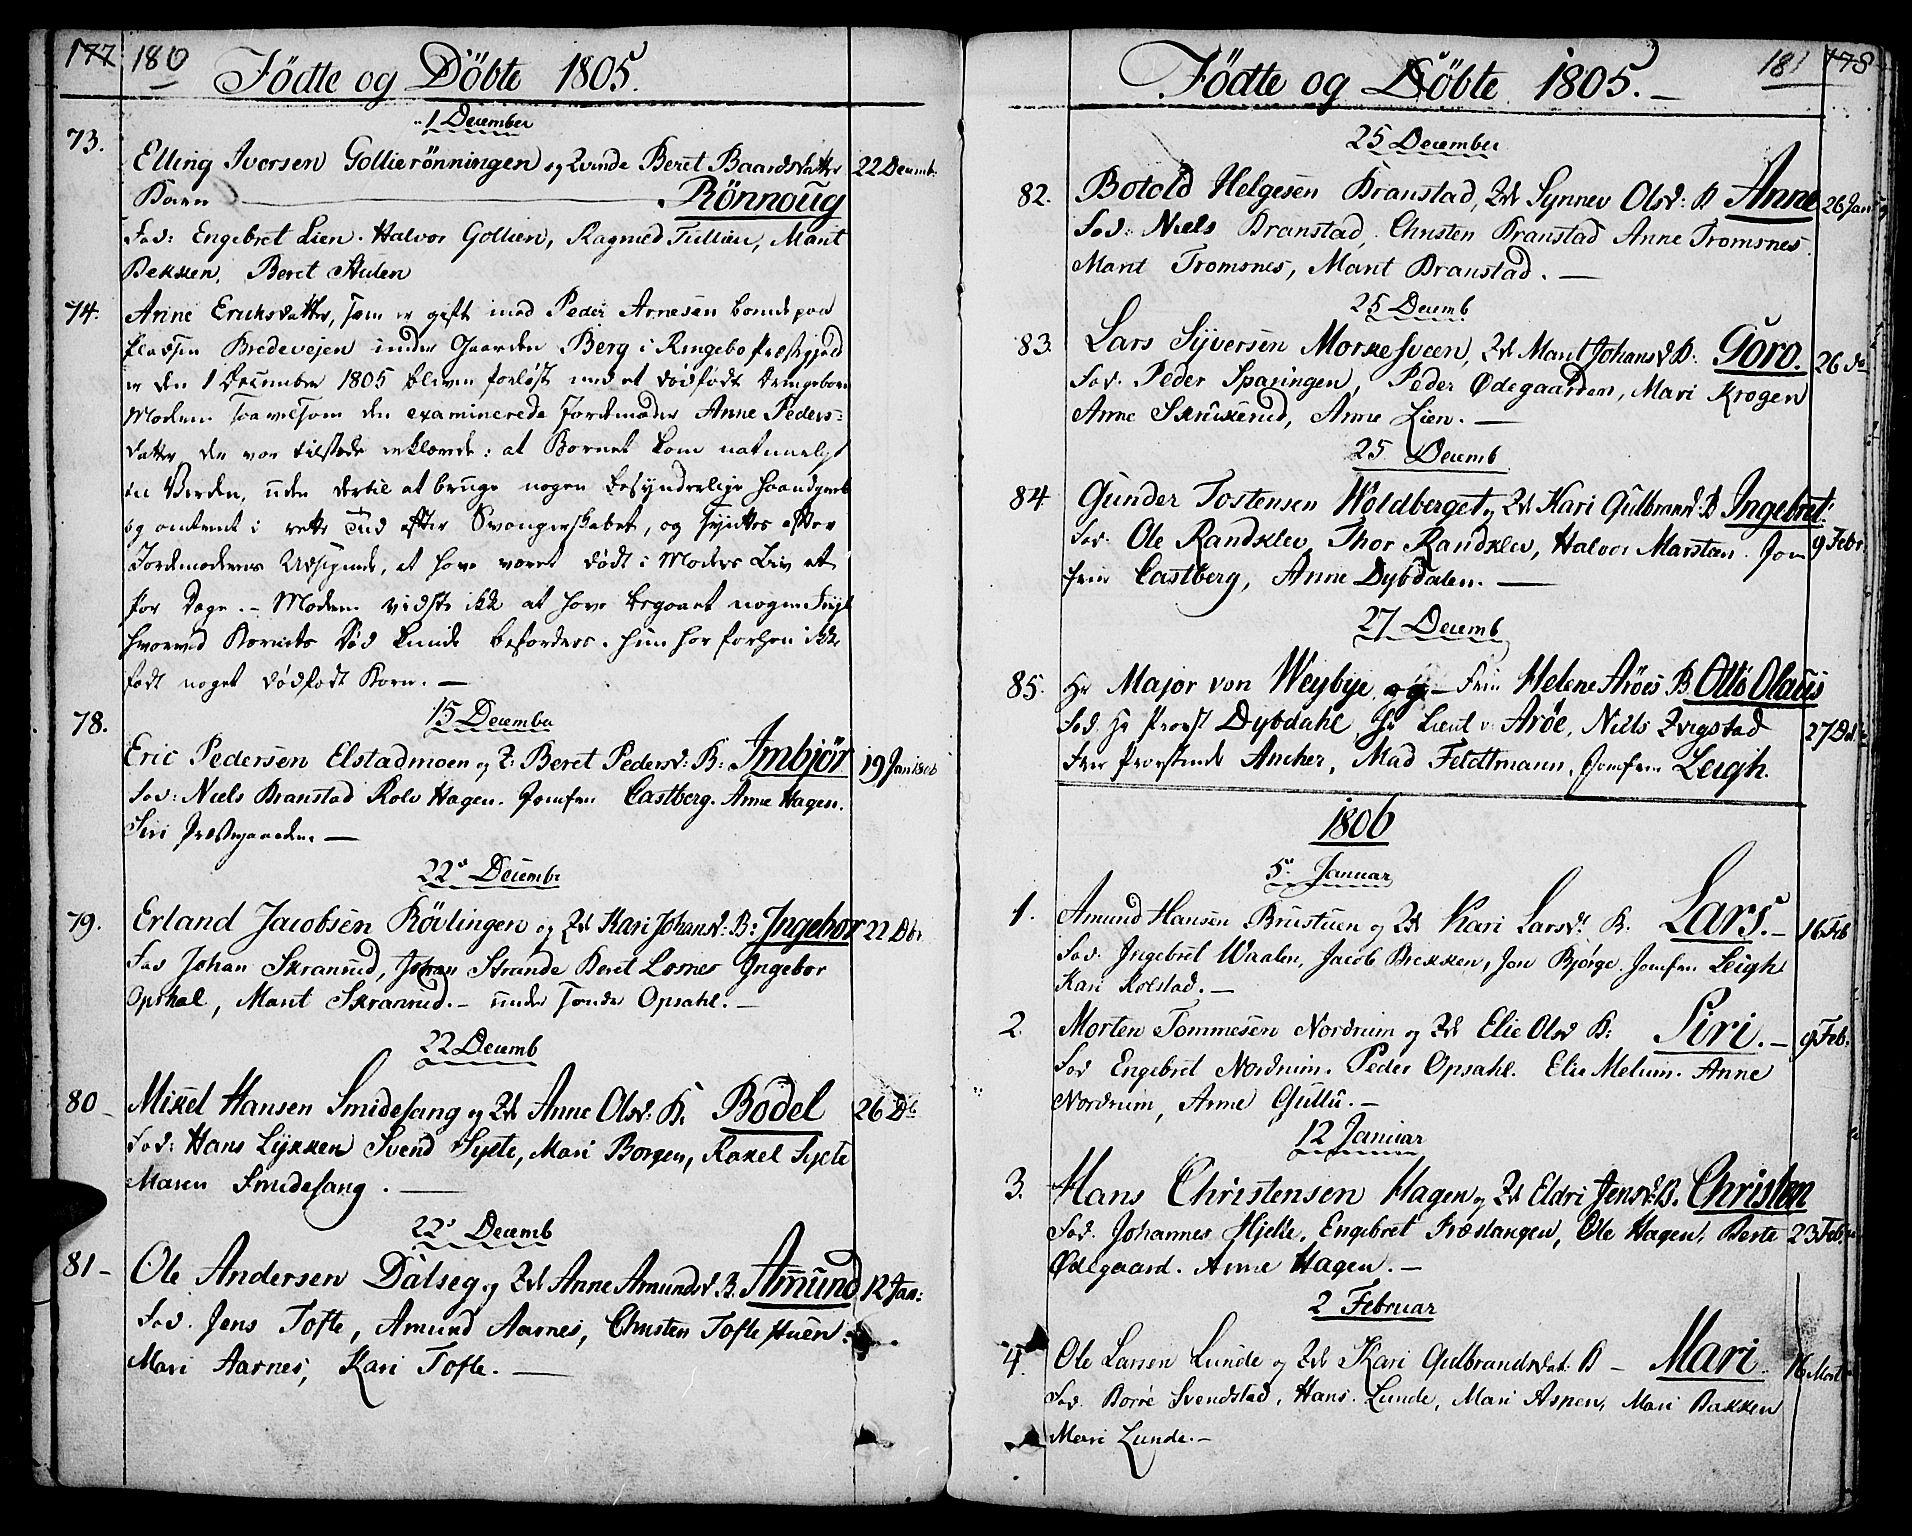 SAH, Ringebu prestekontor, Ministerialbok nr. 3, 1781-1820, s. 180-181